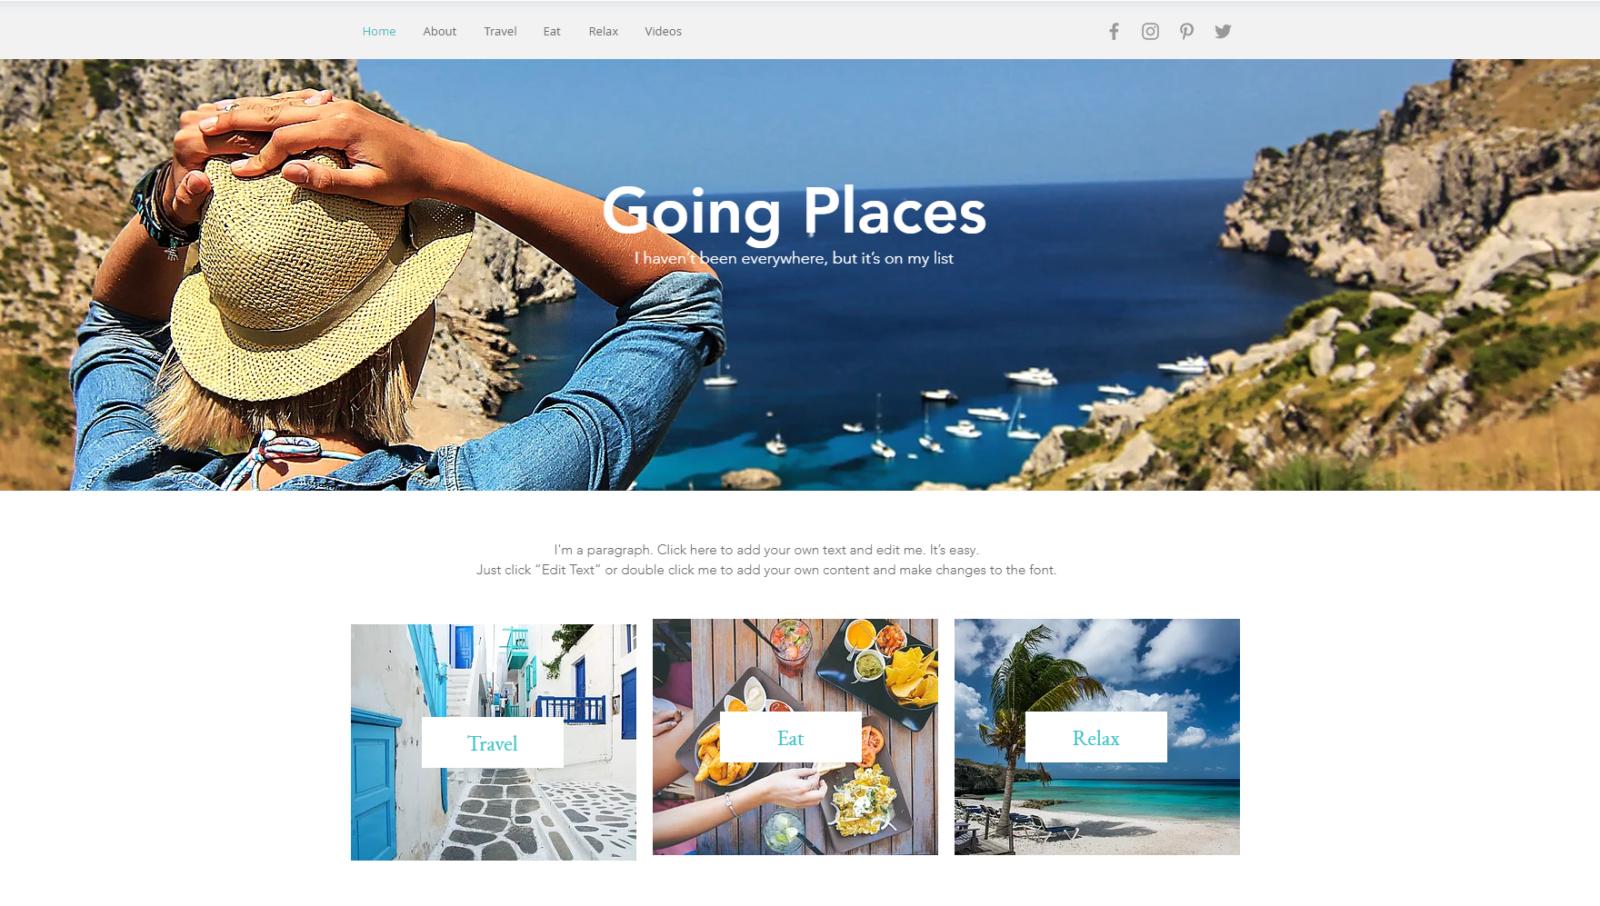 template website example